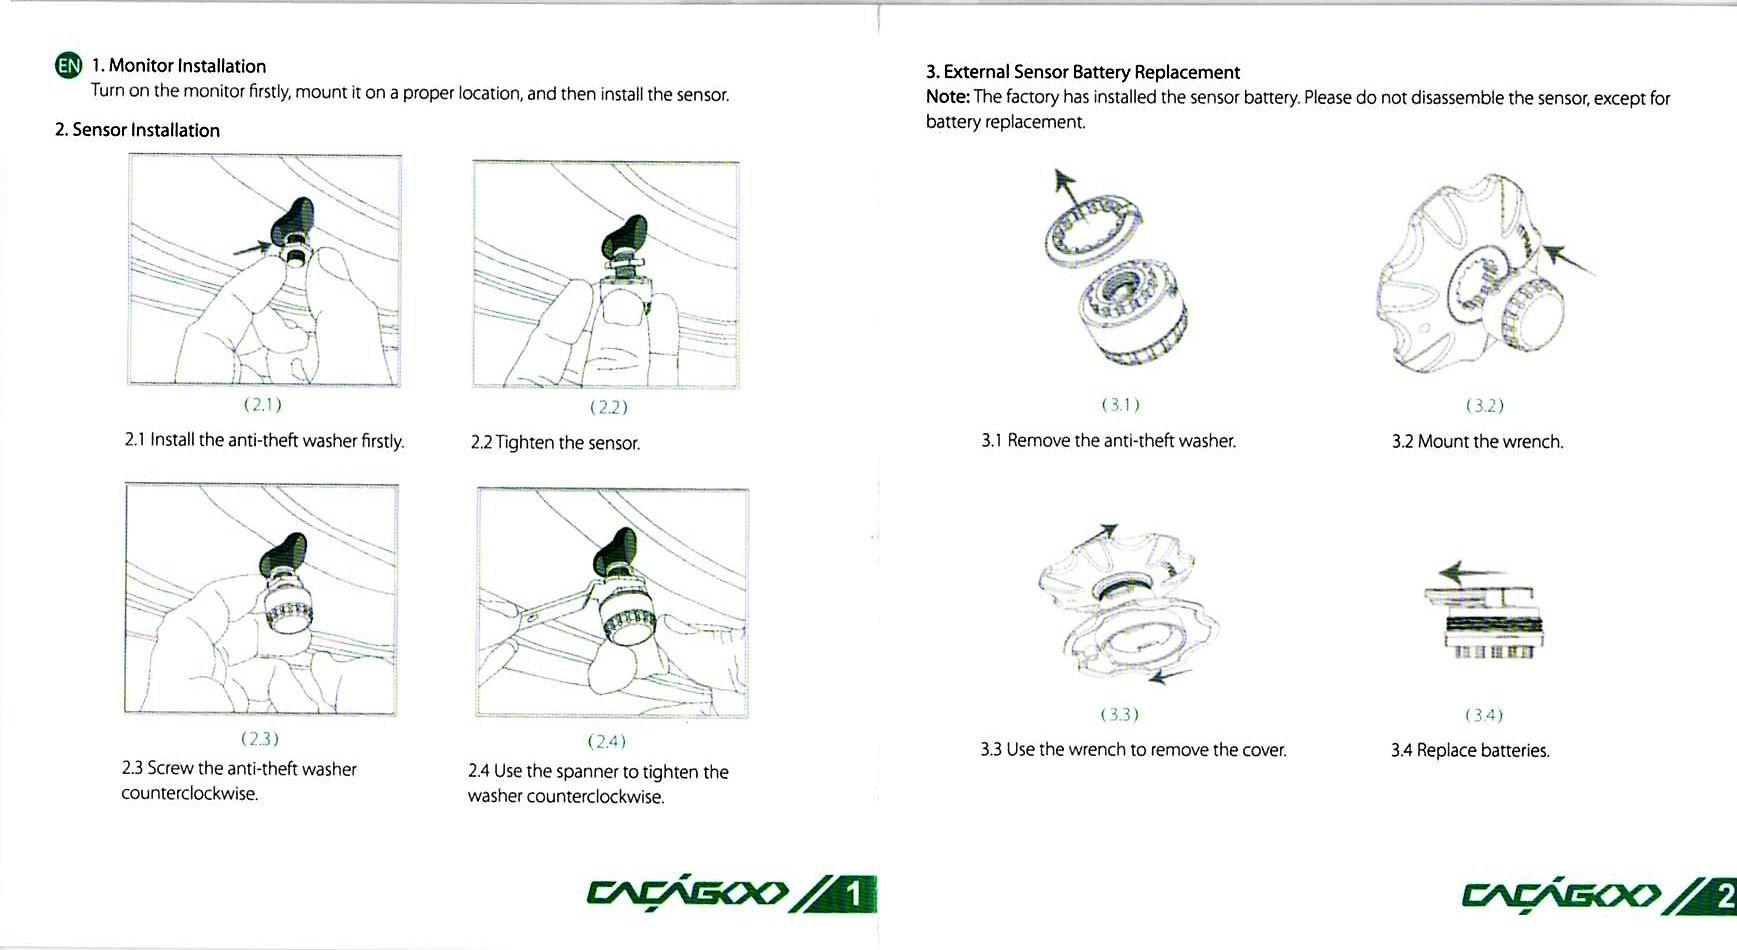 CACAGOO TPMS タイヤ空気圧監視システム 取説 1